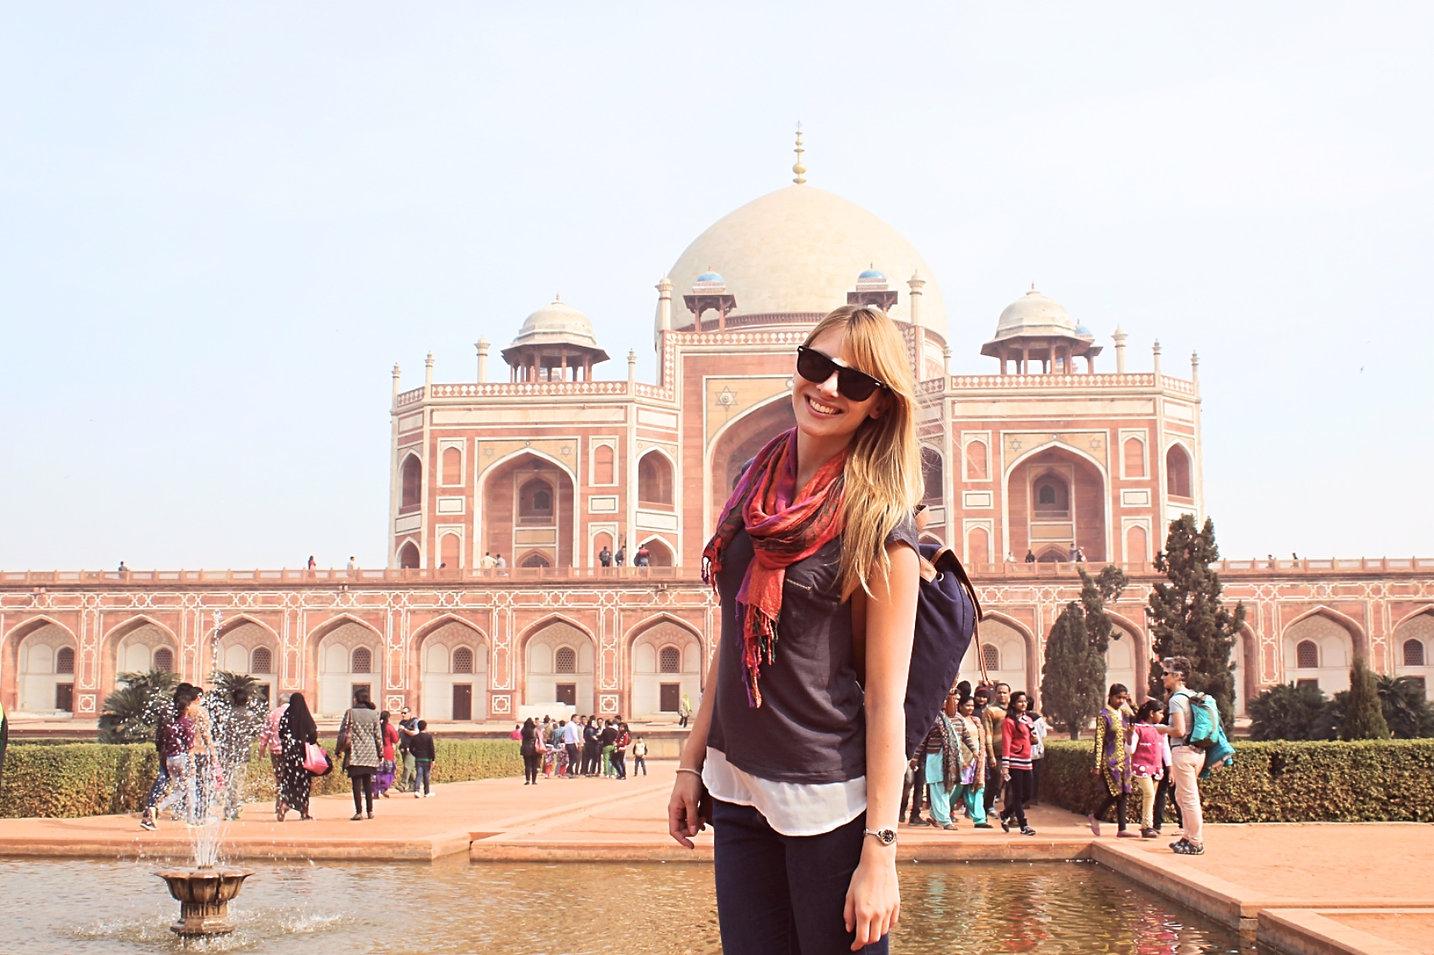 Inde: Voyager seule à New Delhi